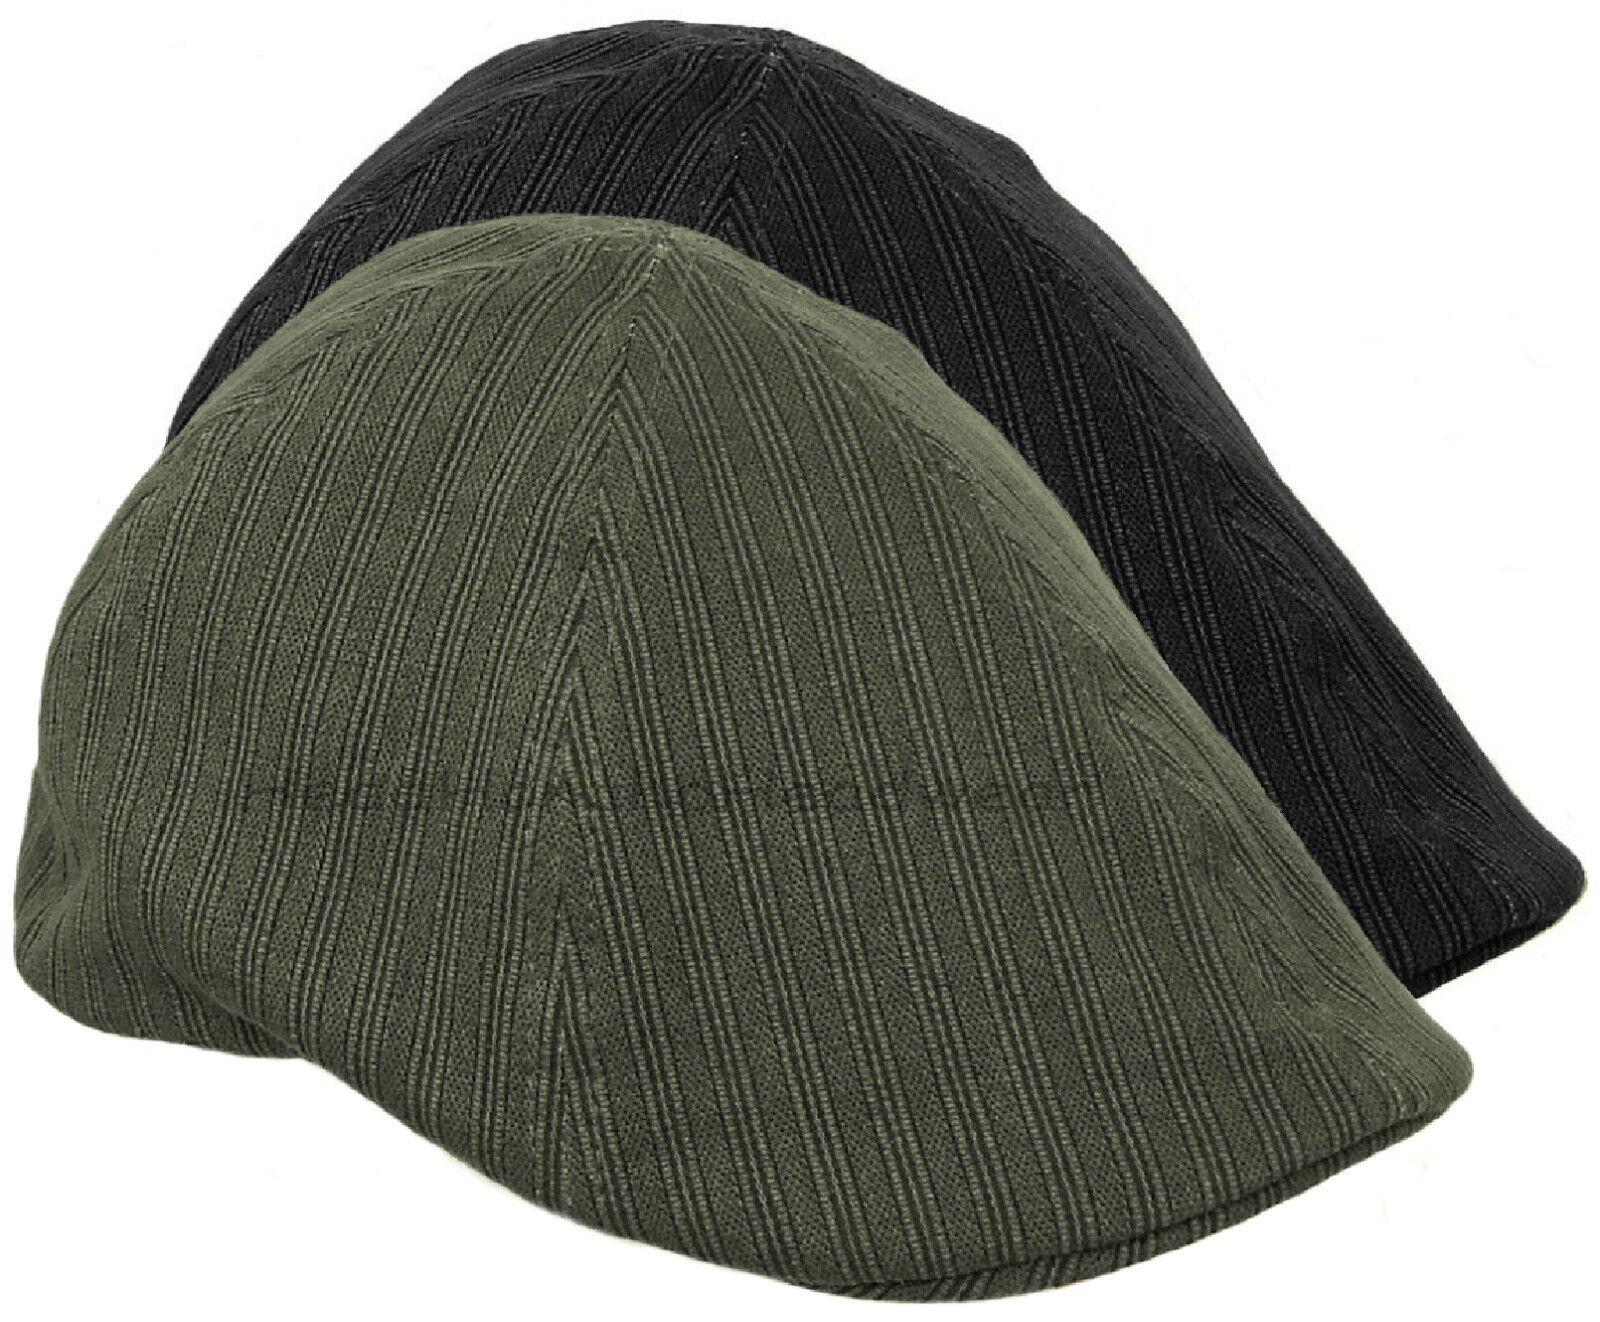 Washed Cotton Duckbill Ivy Cap Men Gatsby Newsboy Hat Golf Driving Flat Cabbie